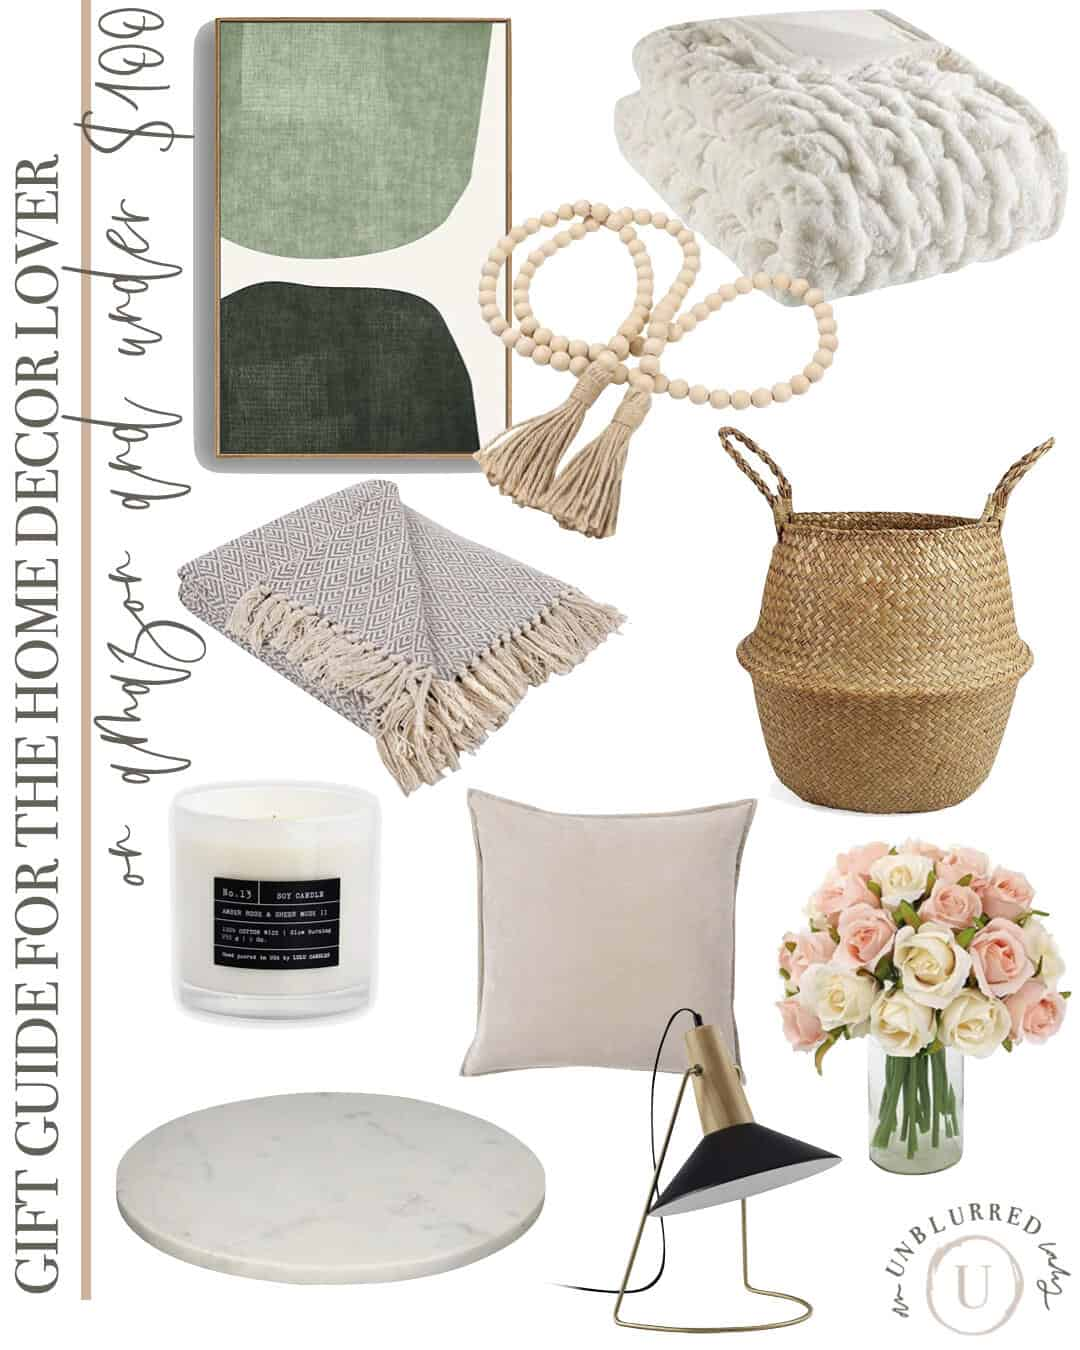 Gift Guide for the Interior Designer